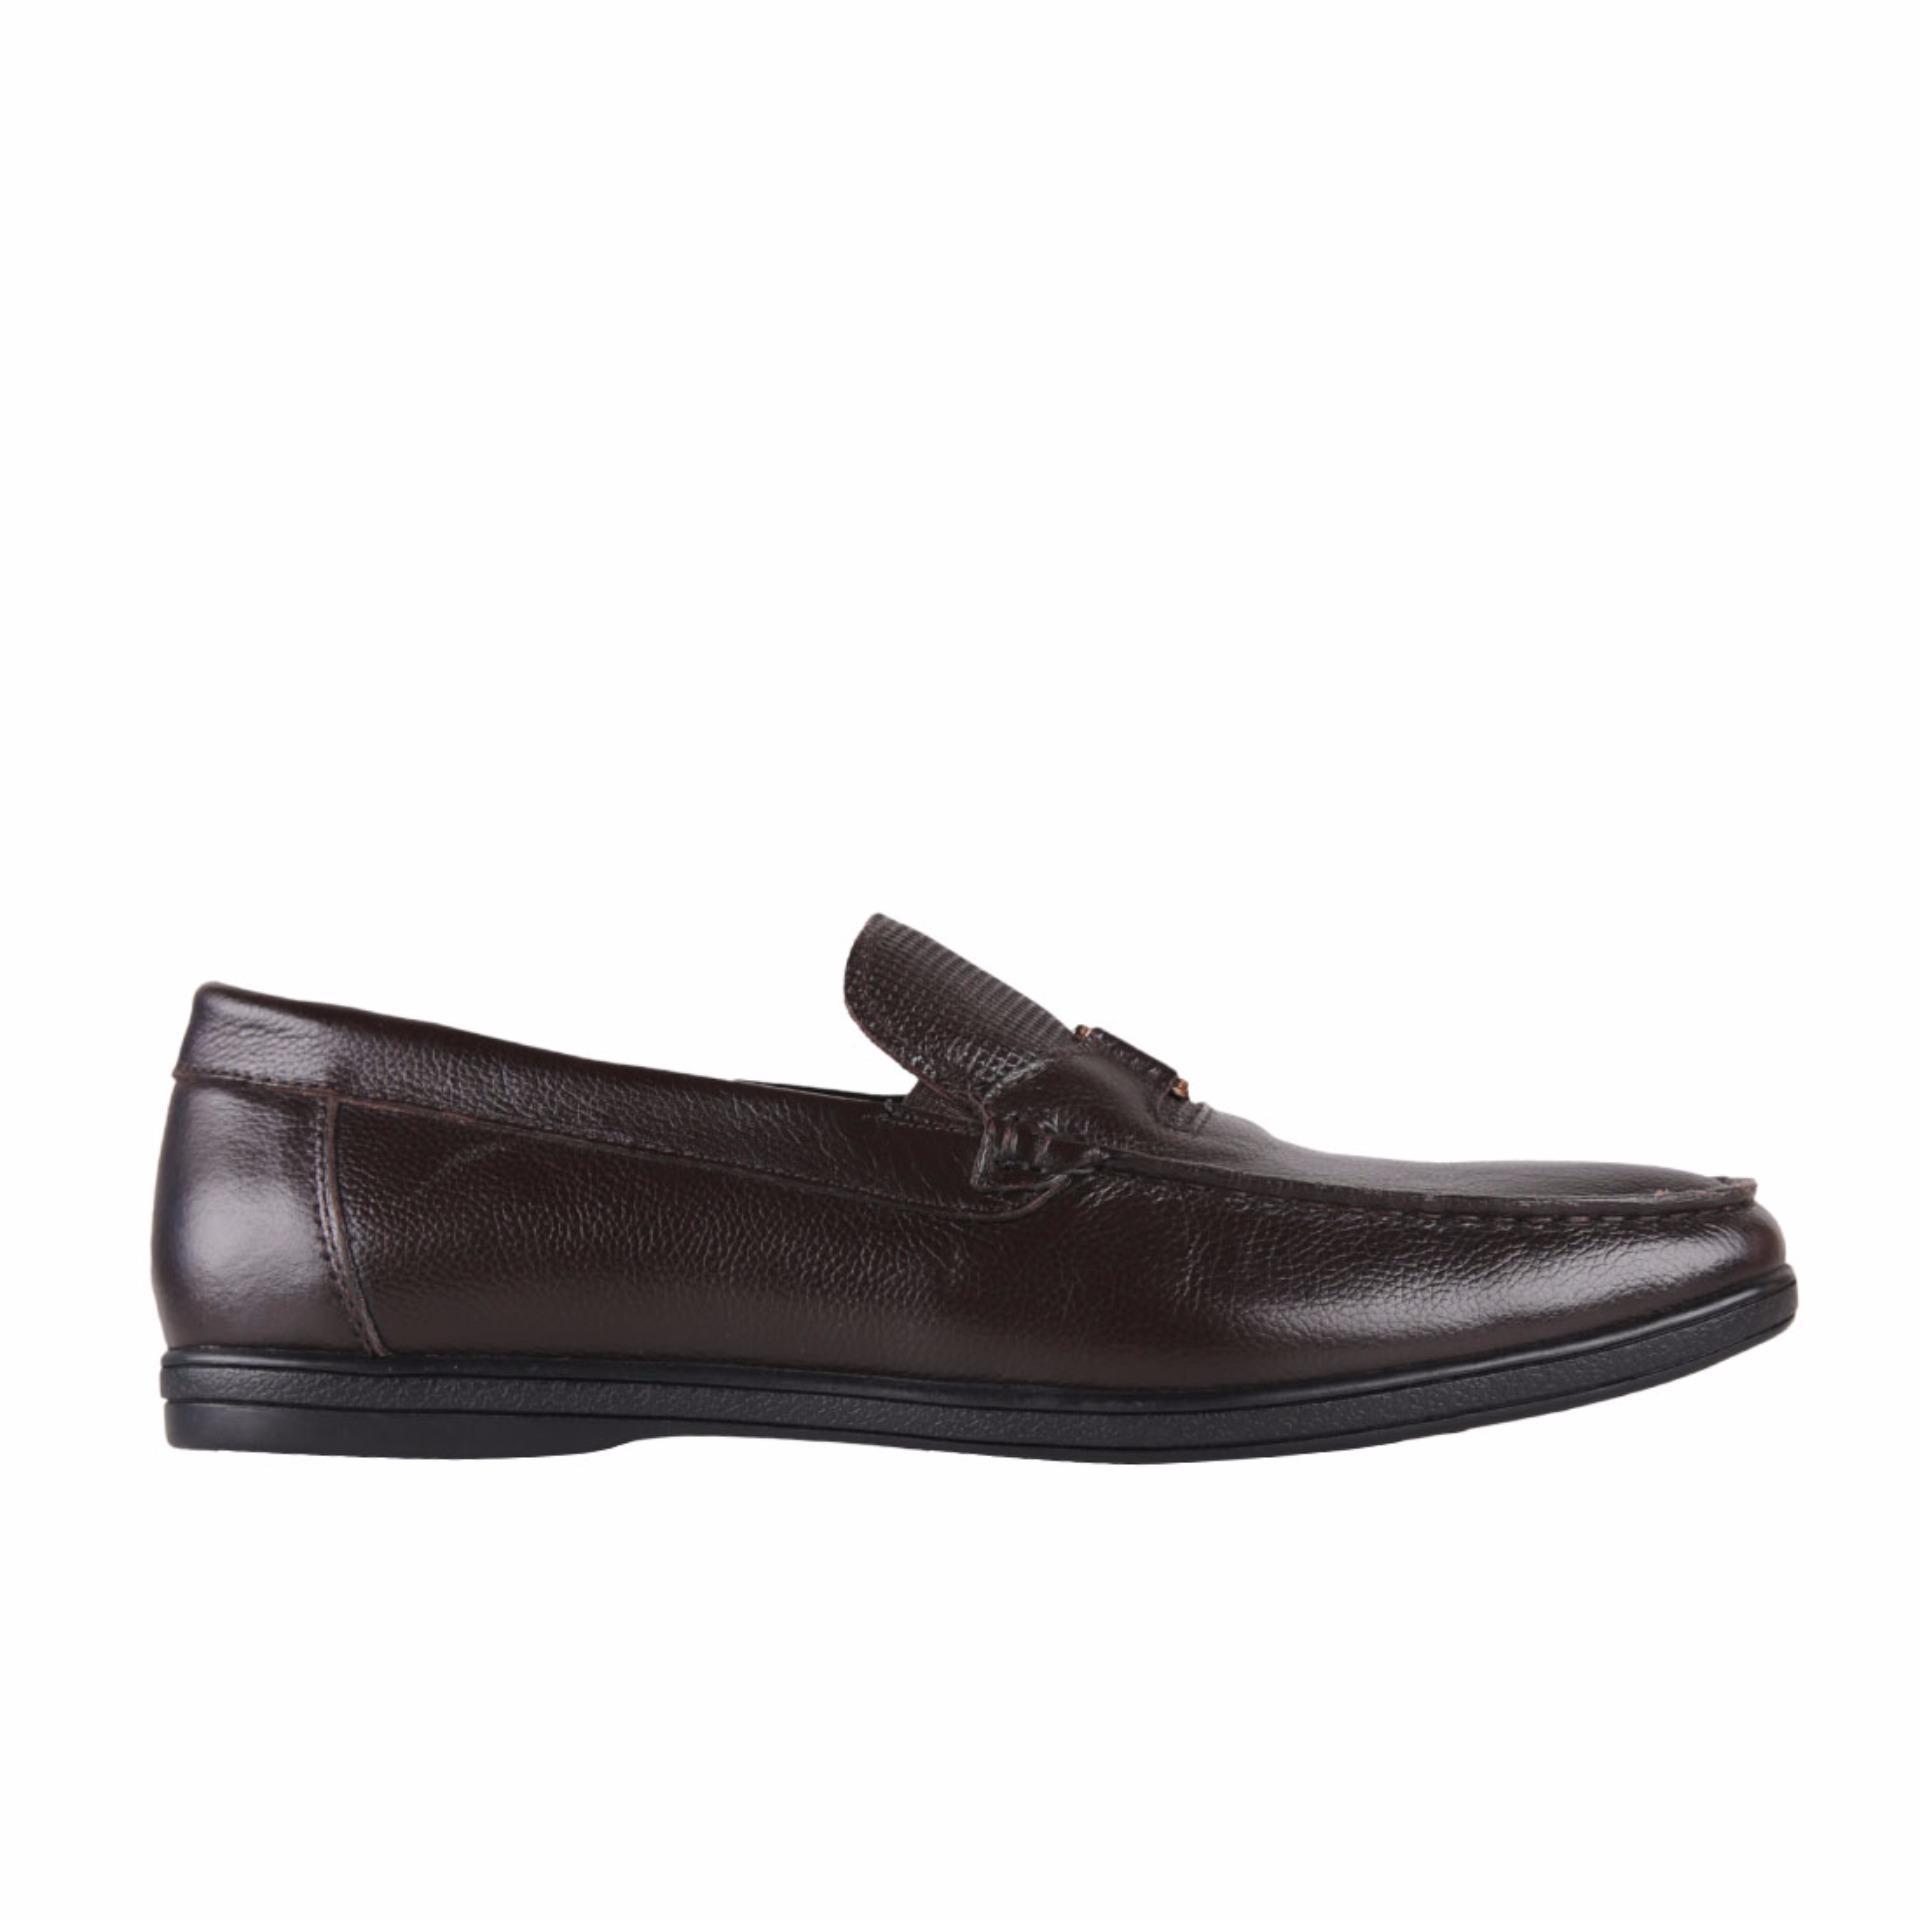 Obermain Sepatu Kasual Pria Gino - Slip On 2